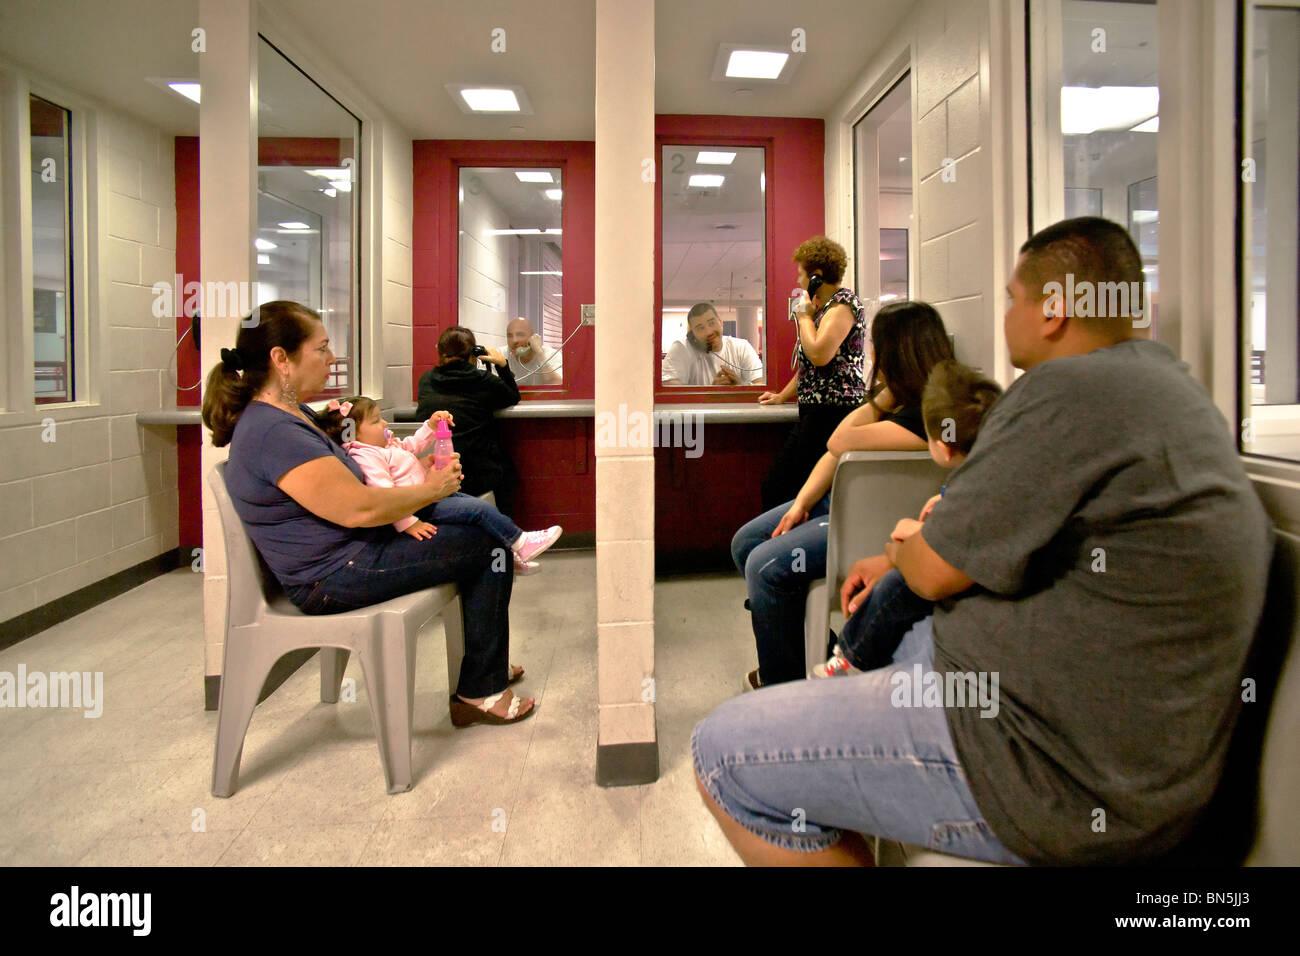 Prison Chatting Room